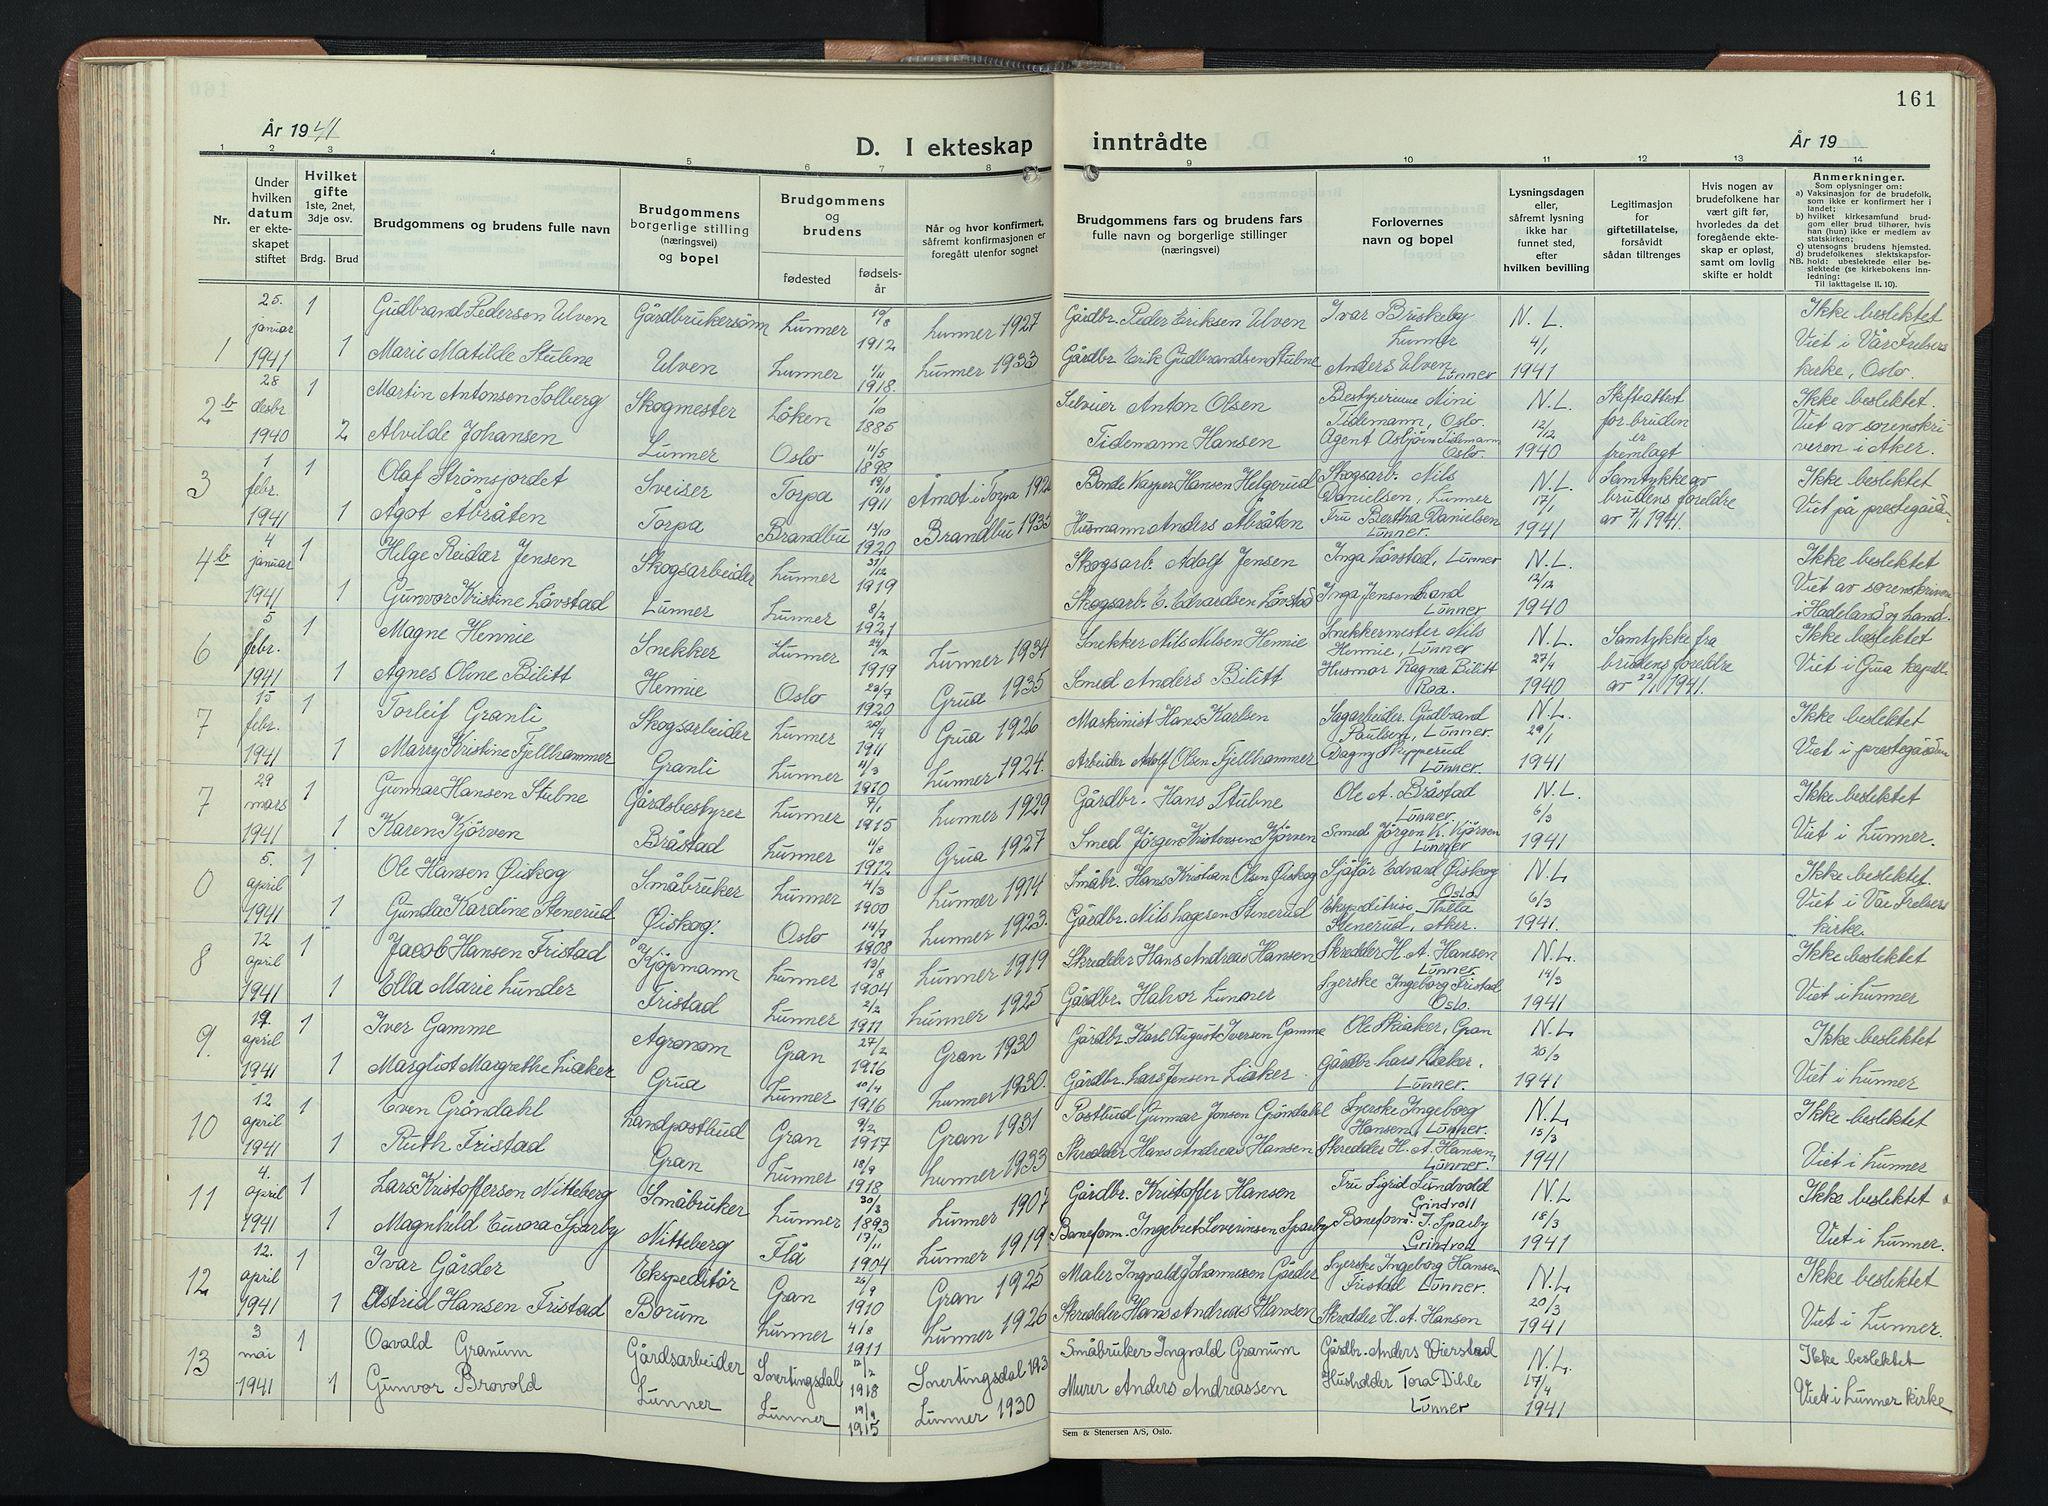 SAH, Lunner prestekontor, H/Ha/Hab/L0003: Klokkerbok nr. 3, 1933-1945, s. 161